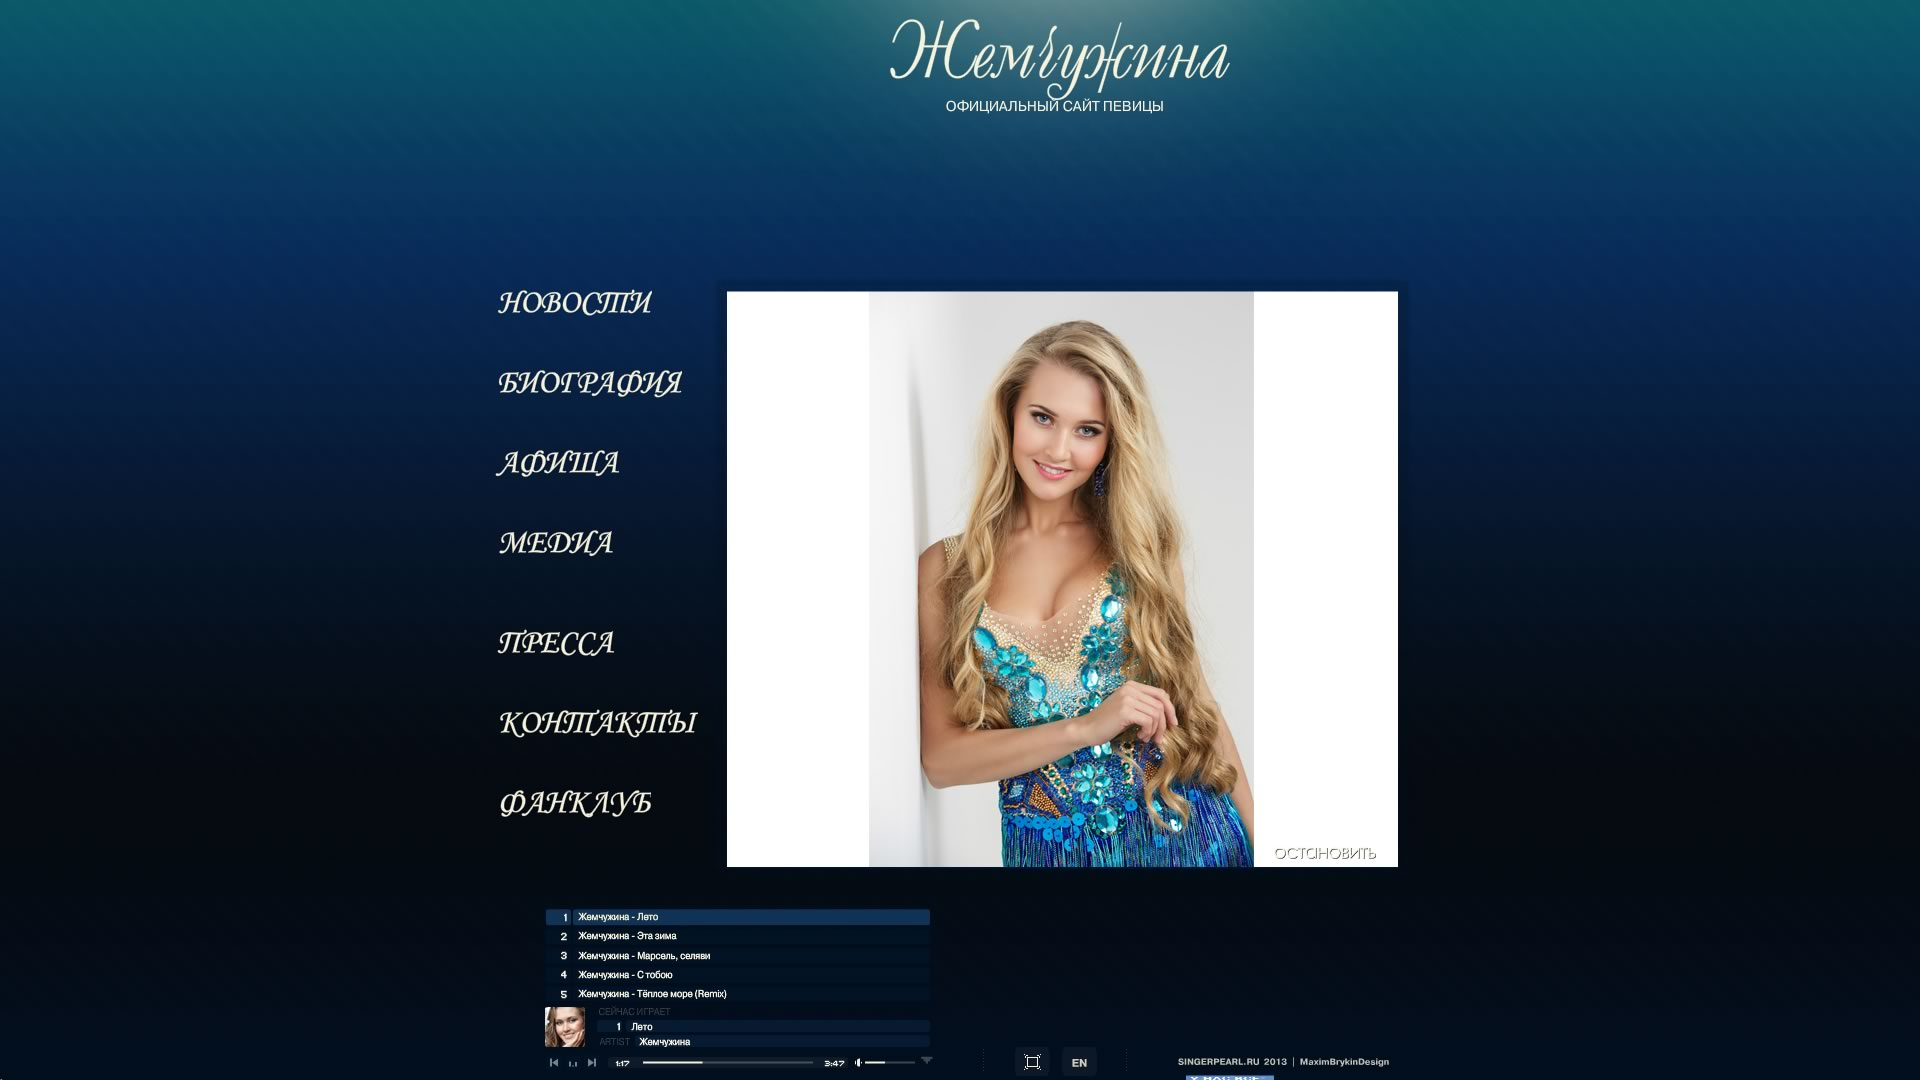 Создание сайта singerpearl.ru (flash) (2)